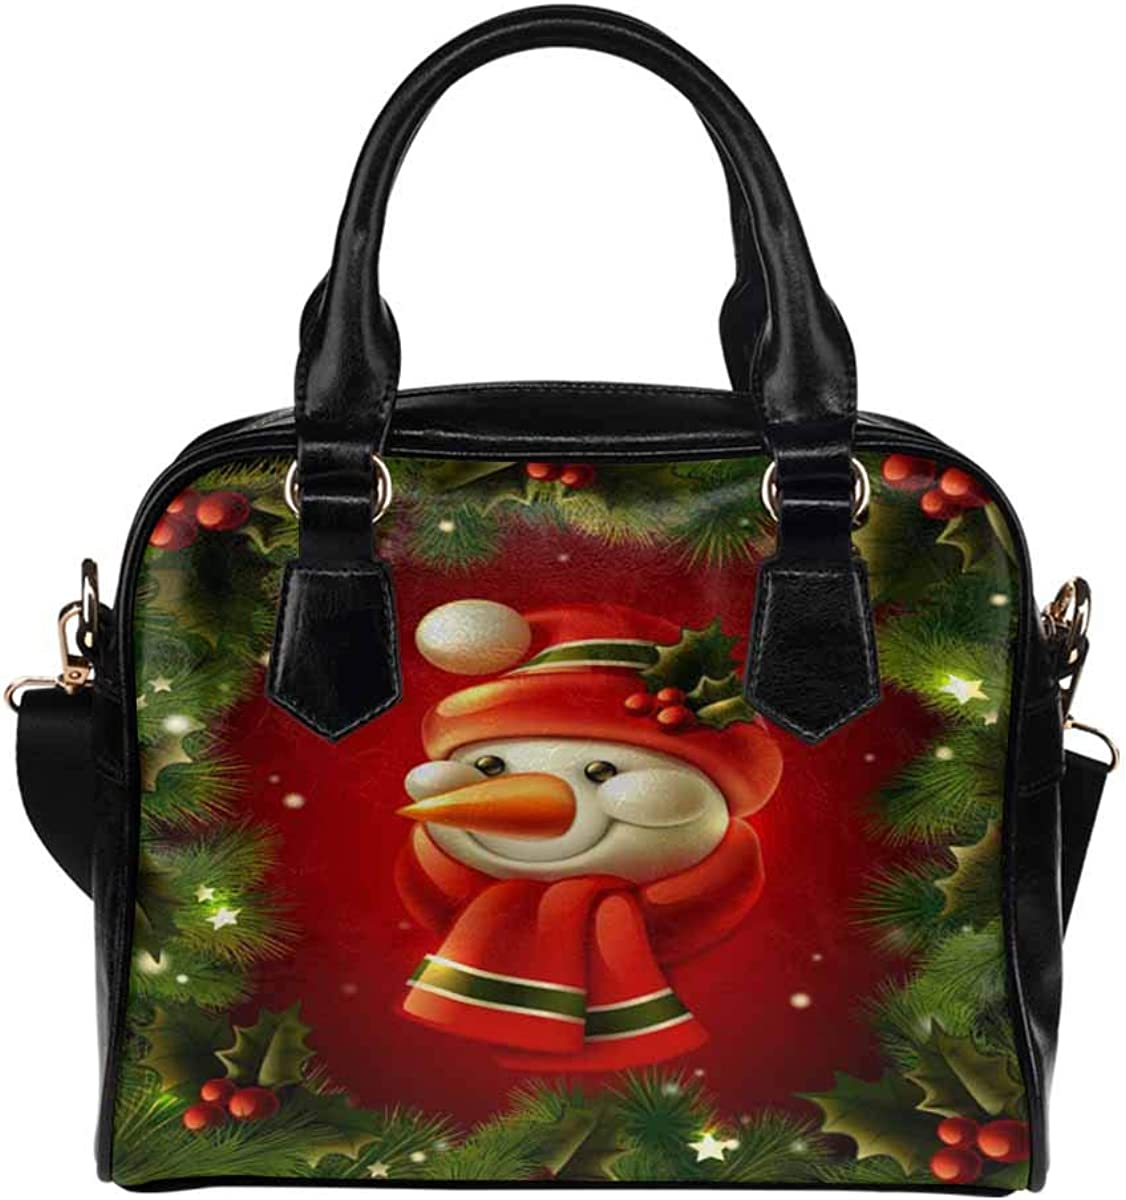 Christmas Santa Snowman Deer Opening large Mesa Mall release sale Xmas Handb PU Leather Women's Purse